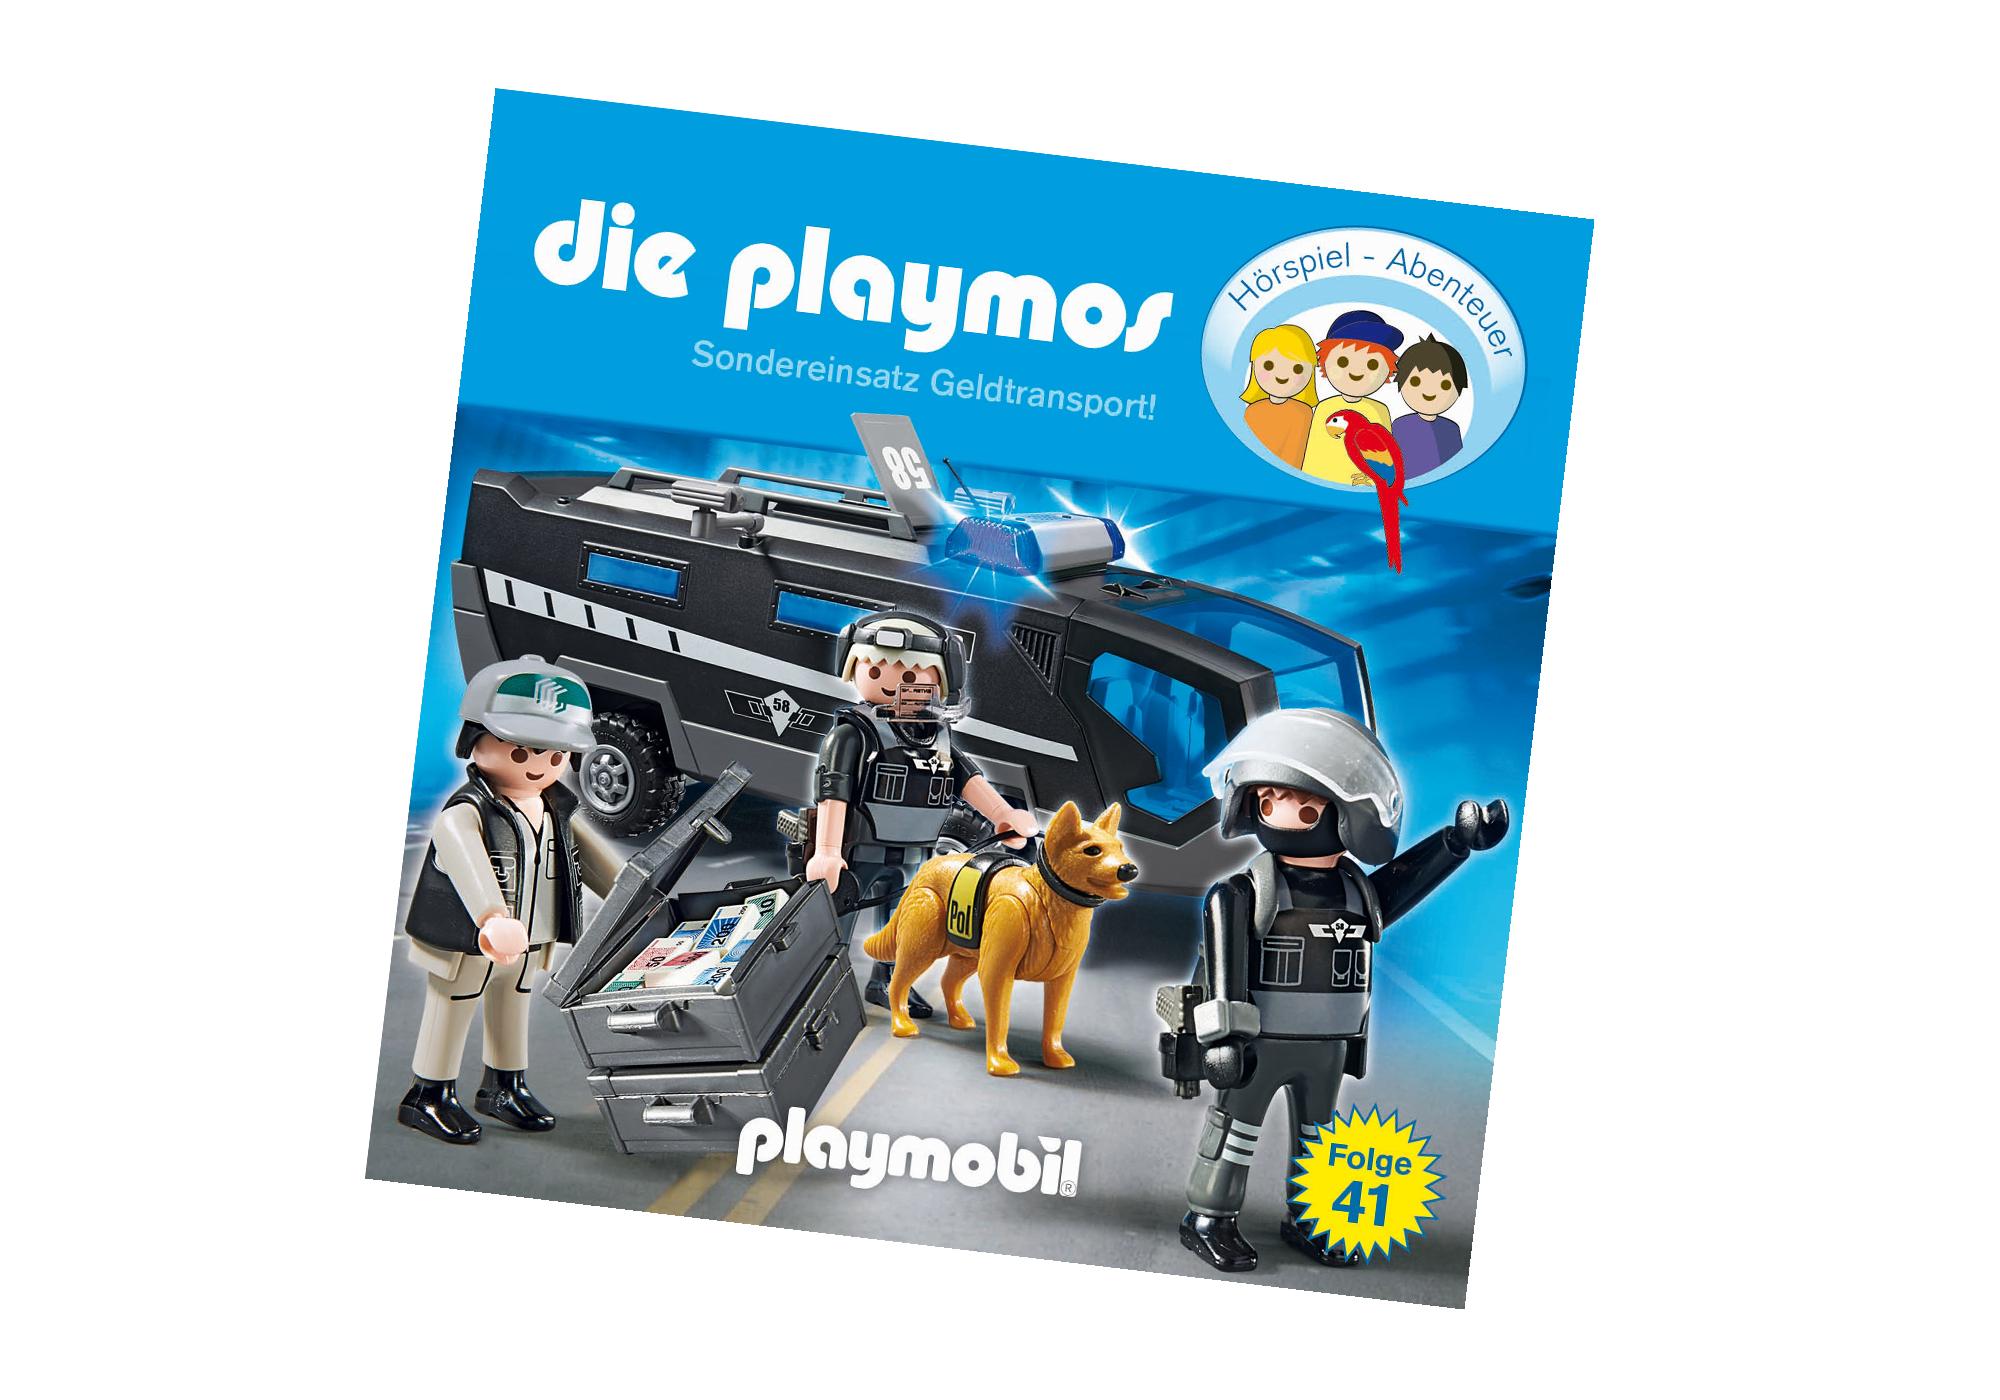 http://media.playmobil.com/i/playmobil/80454_product_detail